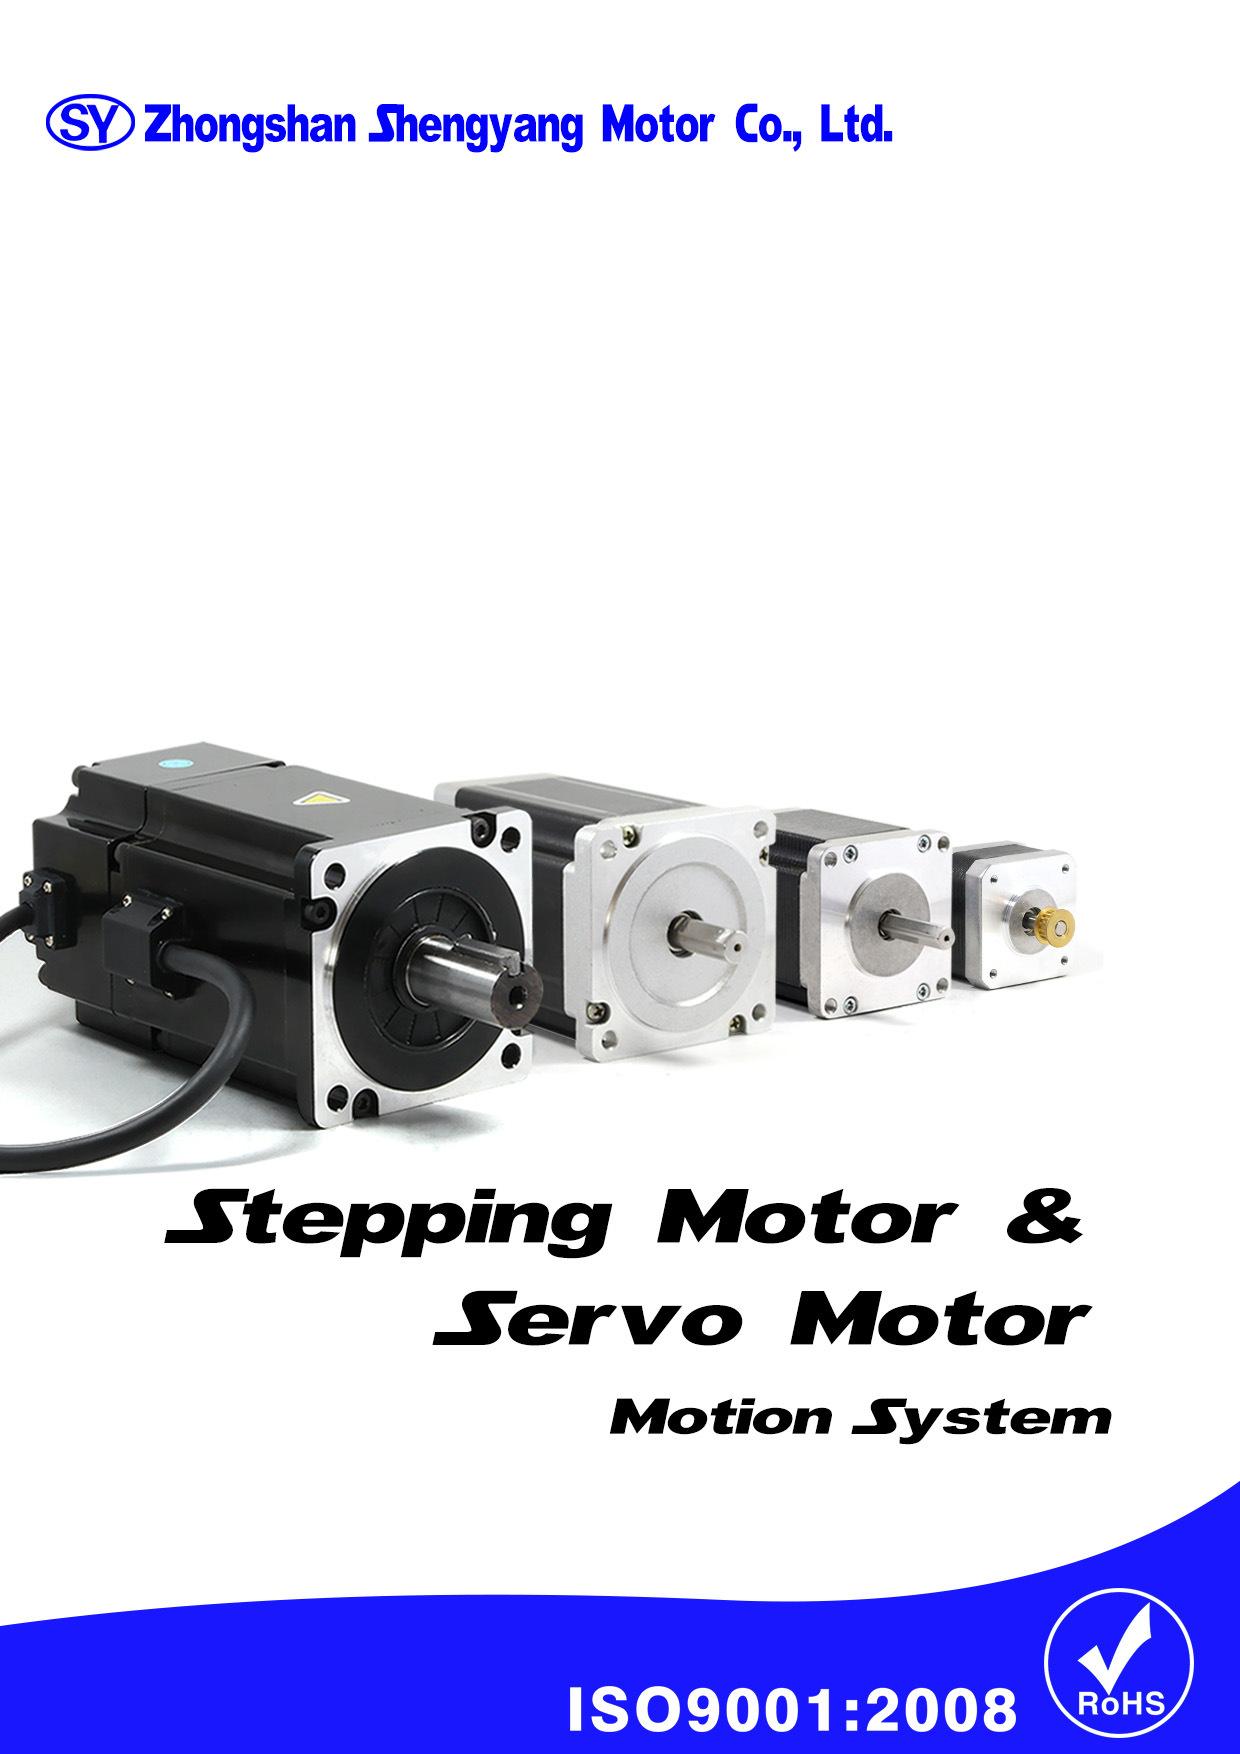 42mm Stepper Electrical Motor for 3D Printer